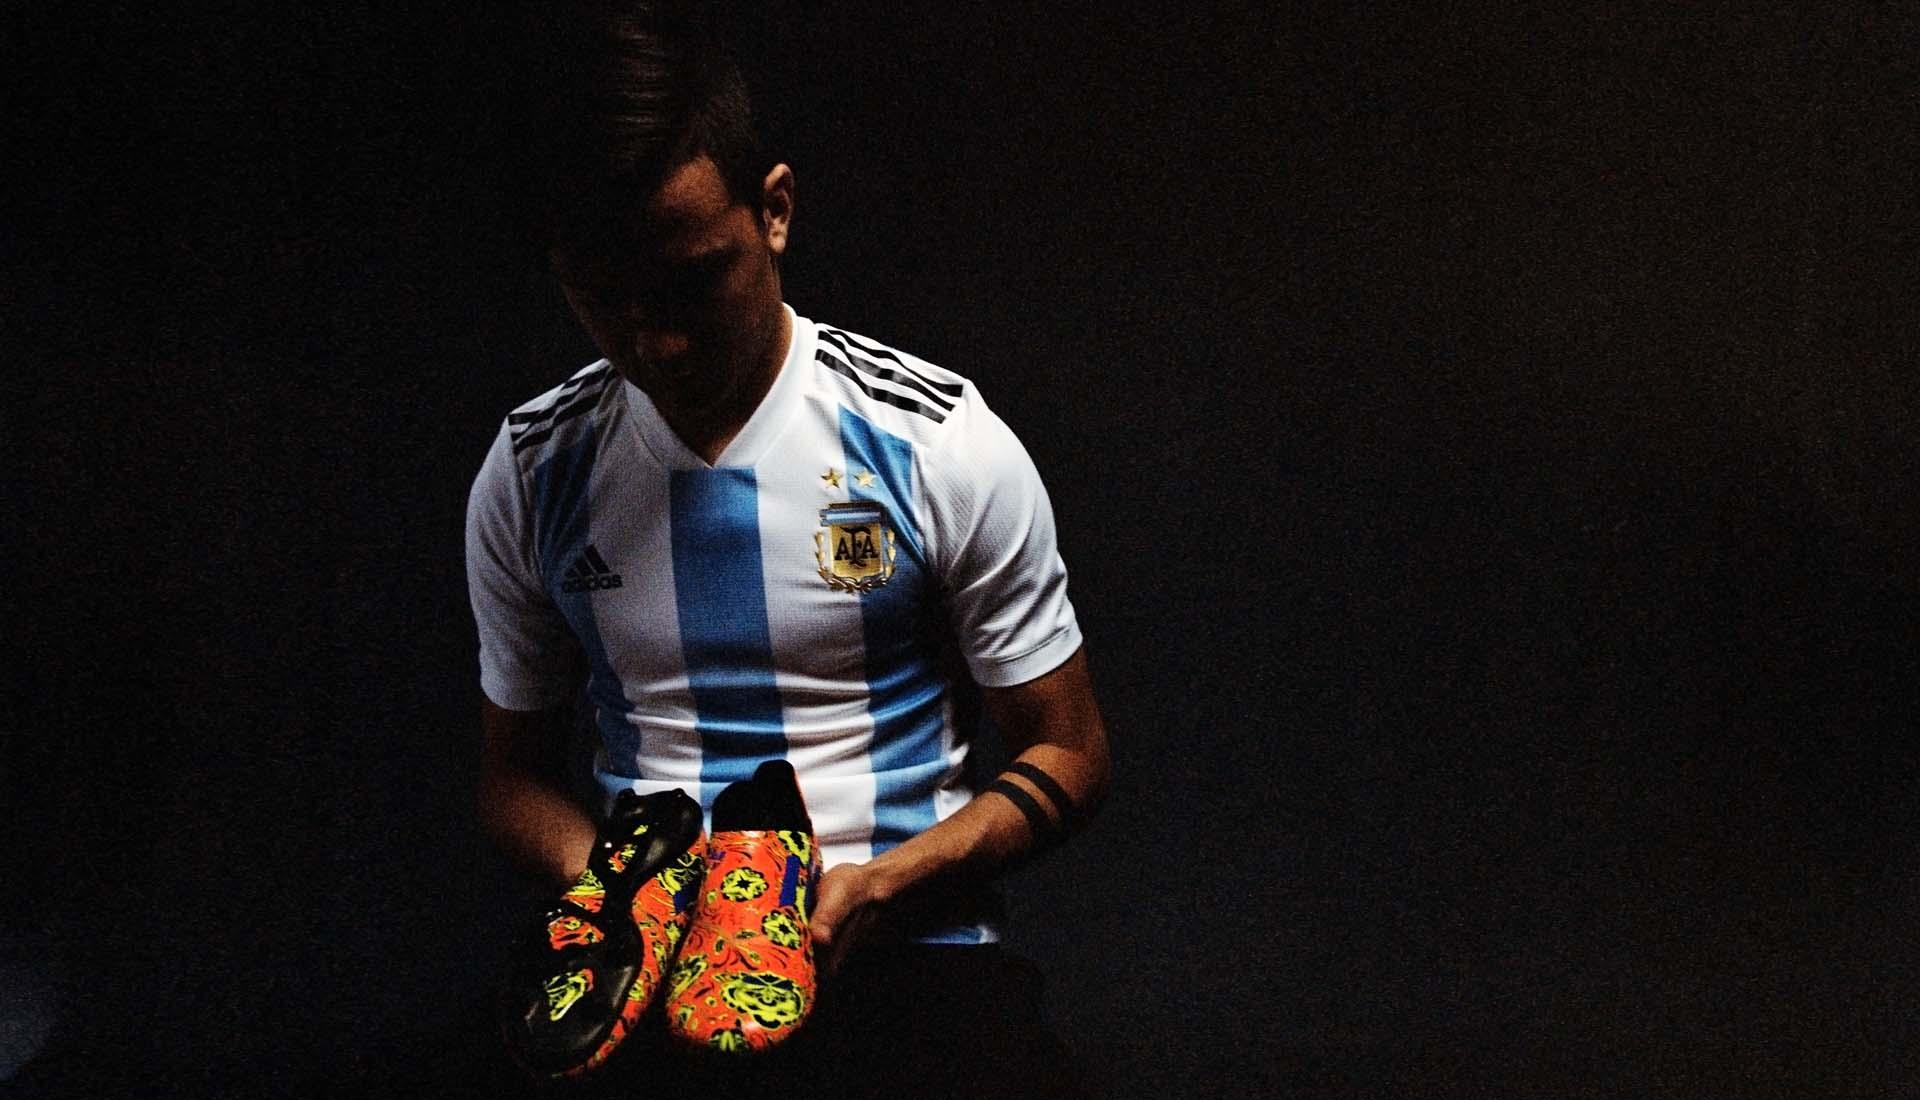 d2f990a13fb adidas Officially Announce Dybala Deal - SoccerBible